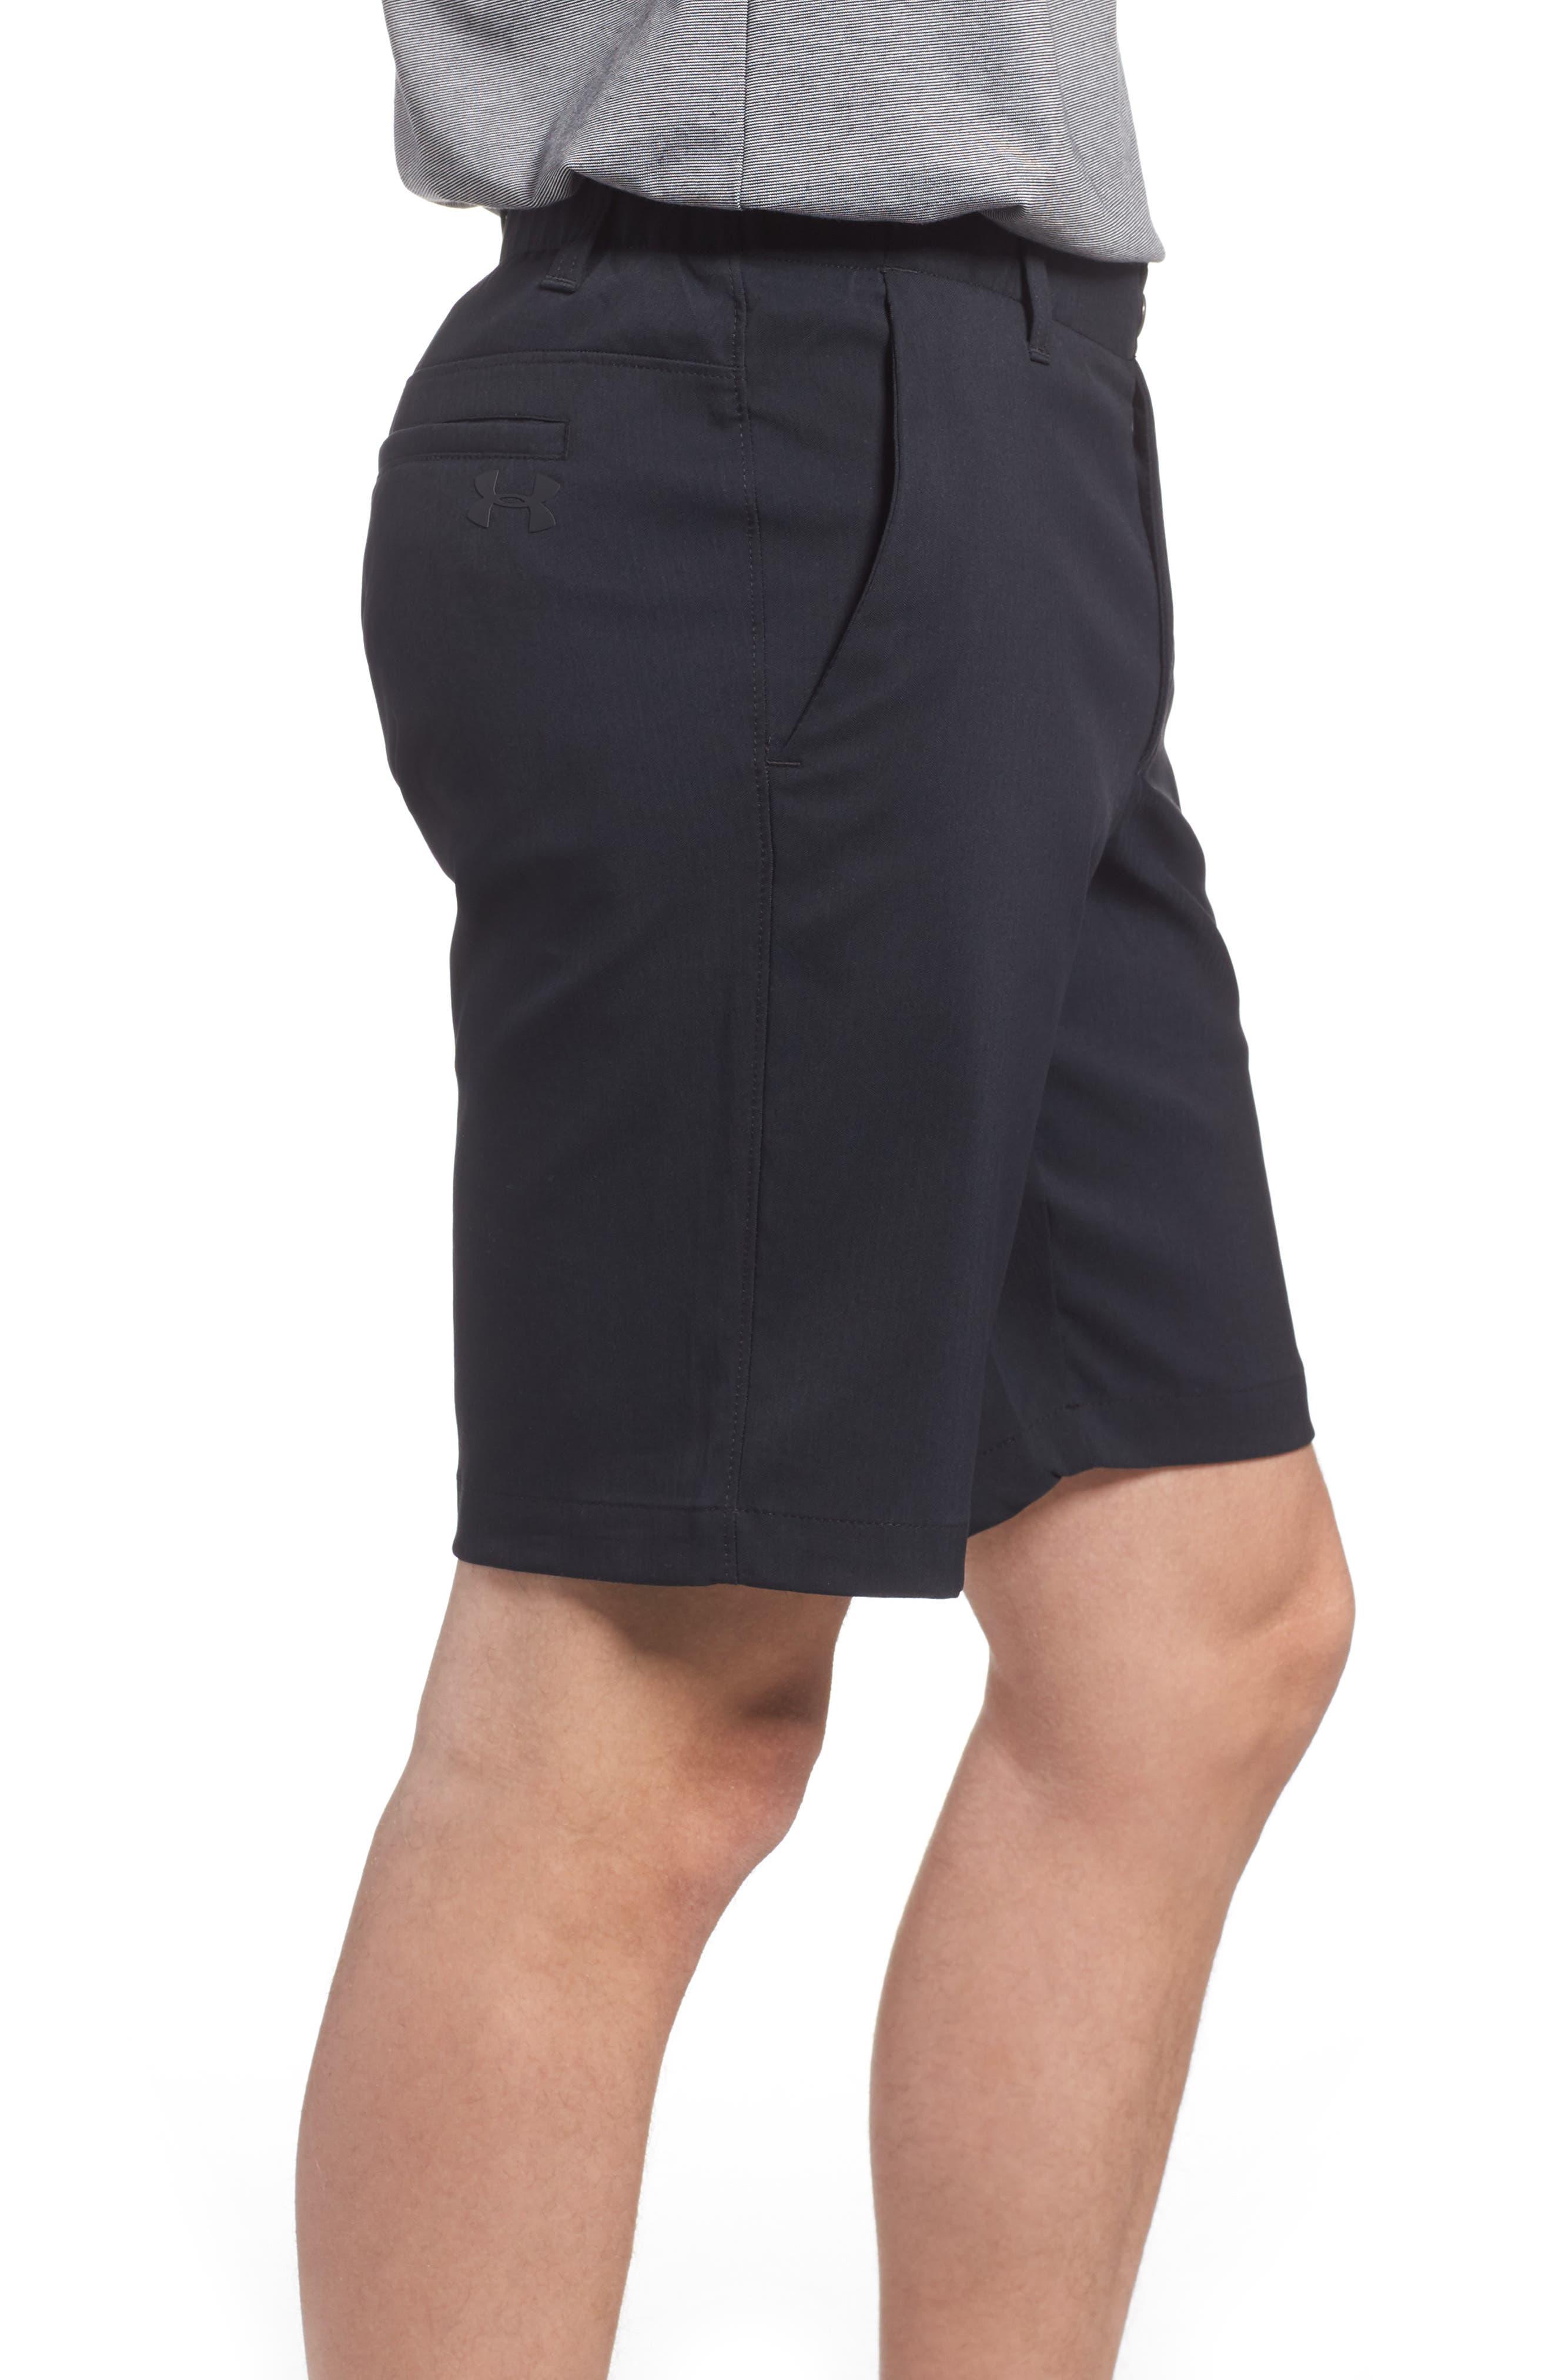 Takeover Regular Fit Golf Shorts,                             Alternate thumbnail 3, color,                             BLACK